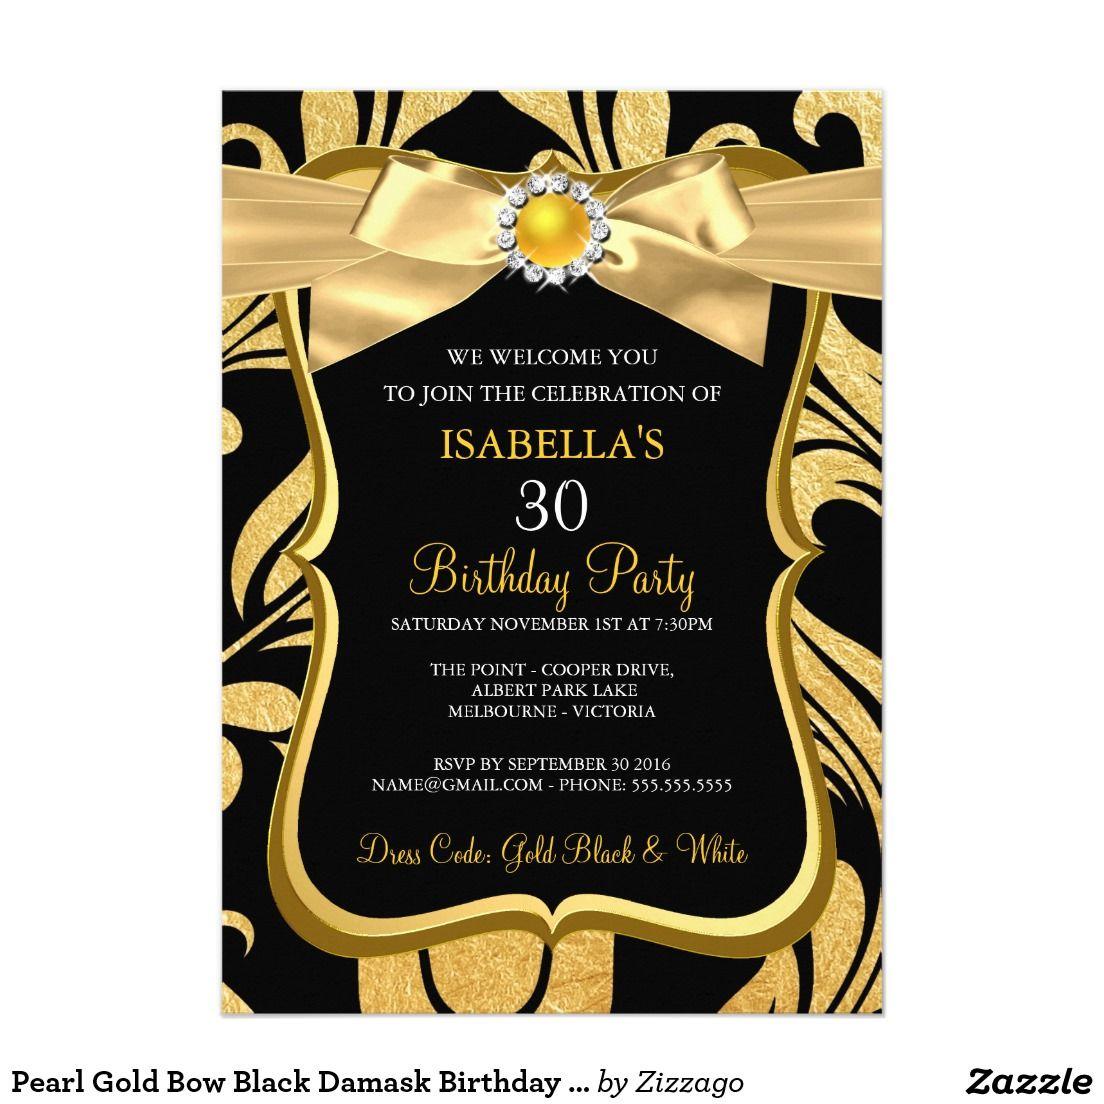 Pearl Gold Bow Black Damask Birthday Invite | Invitation background ...